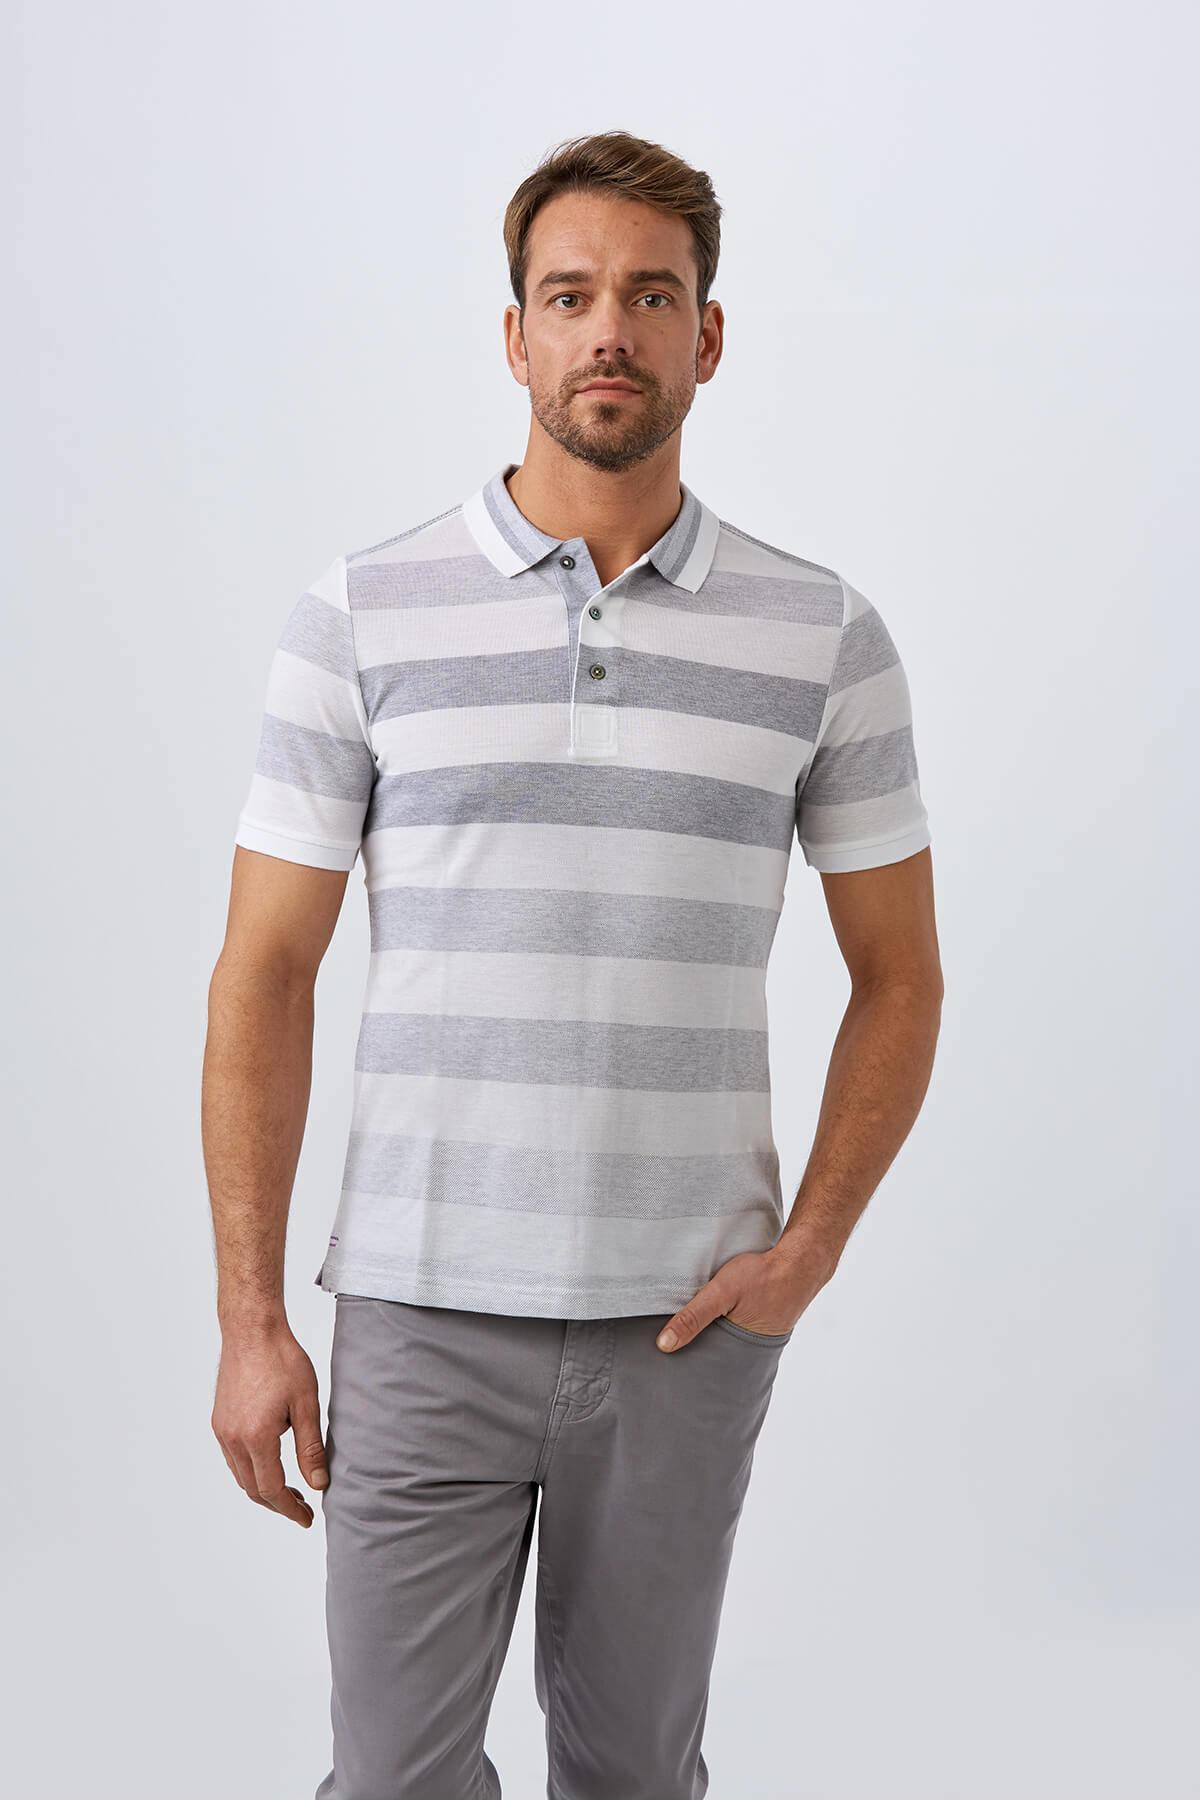 Açık Gri Çizgili Polo Yaka T-Shirt